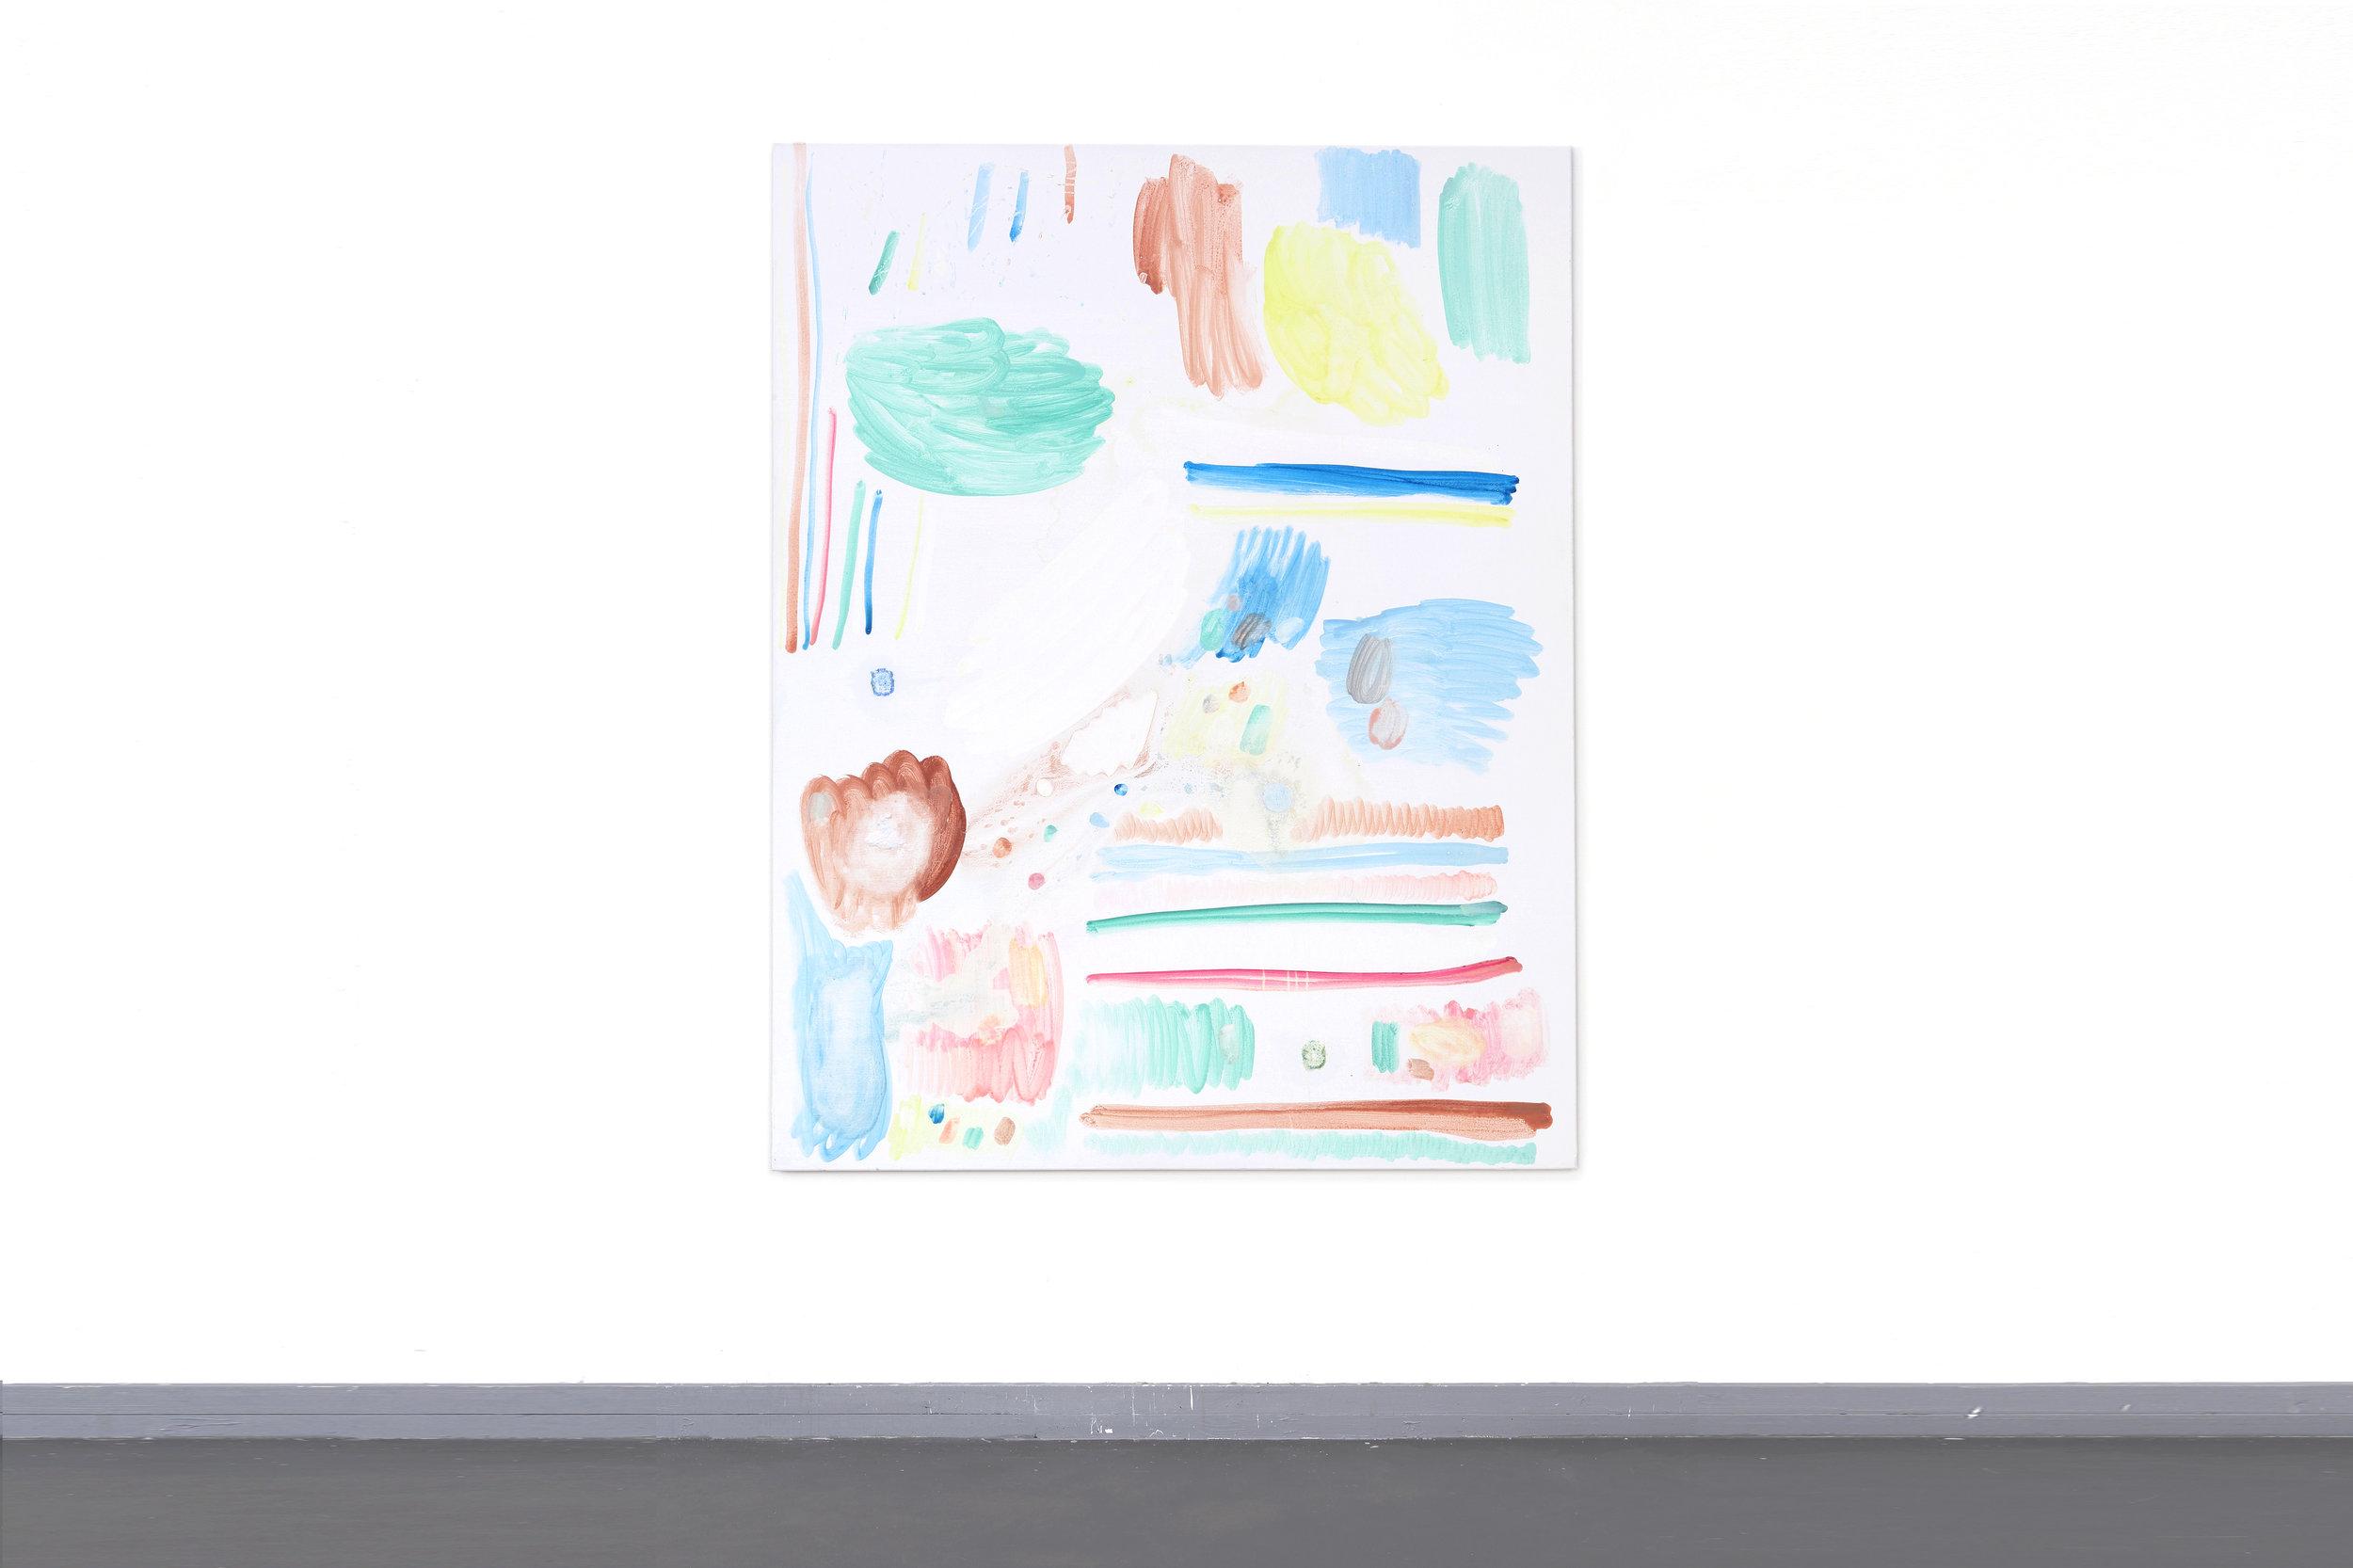 Testdoek 3 - Egg-tempera, Vanish Oxi Action, chlorine, toilet-tabs and bath-bombs on canvas, 180 x 150 cm, 2017